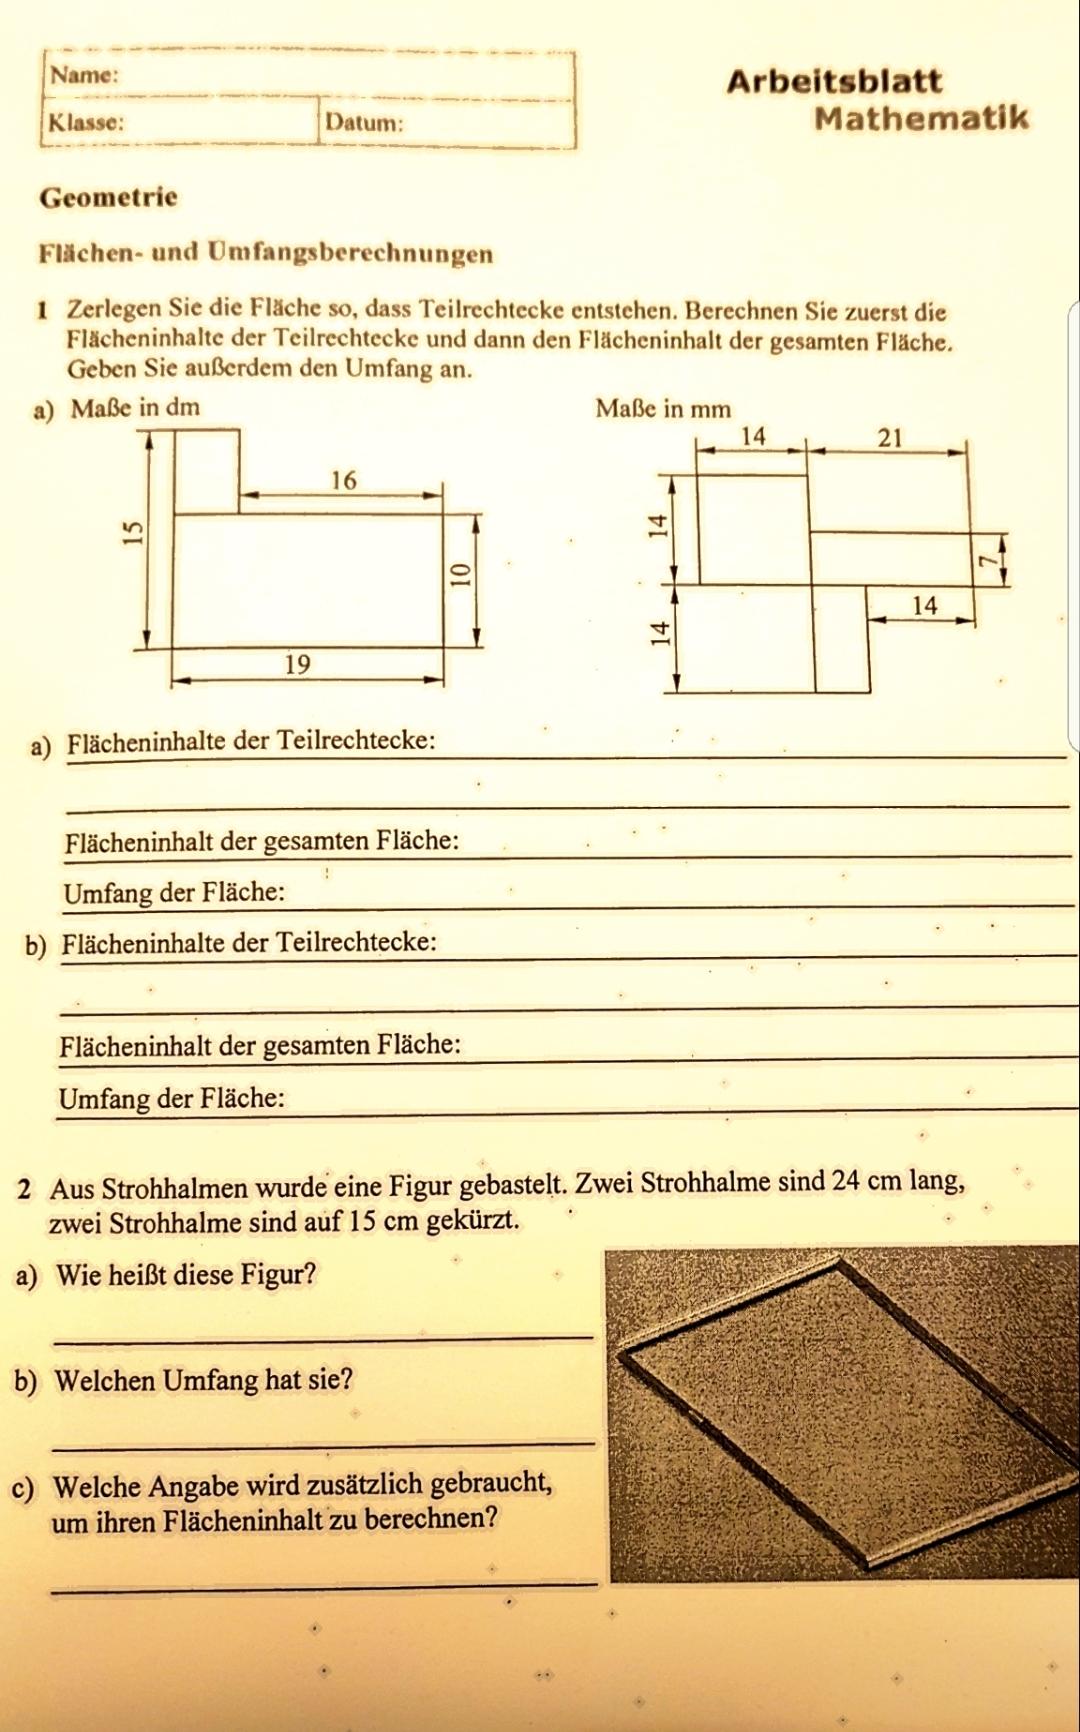 Arbeitsblätter Mathe Klasse 1 Zahlen Zerlegen